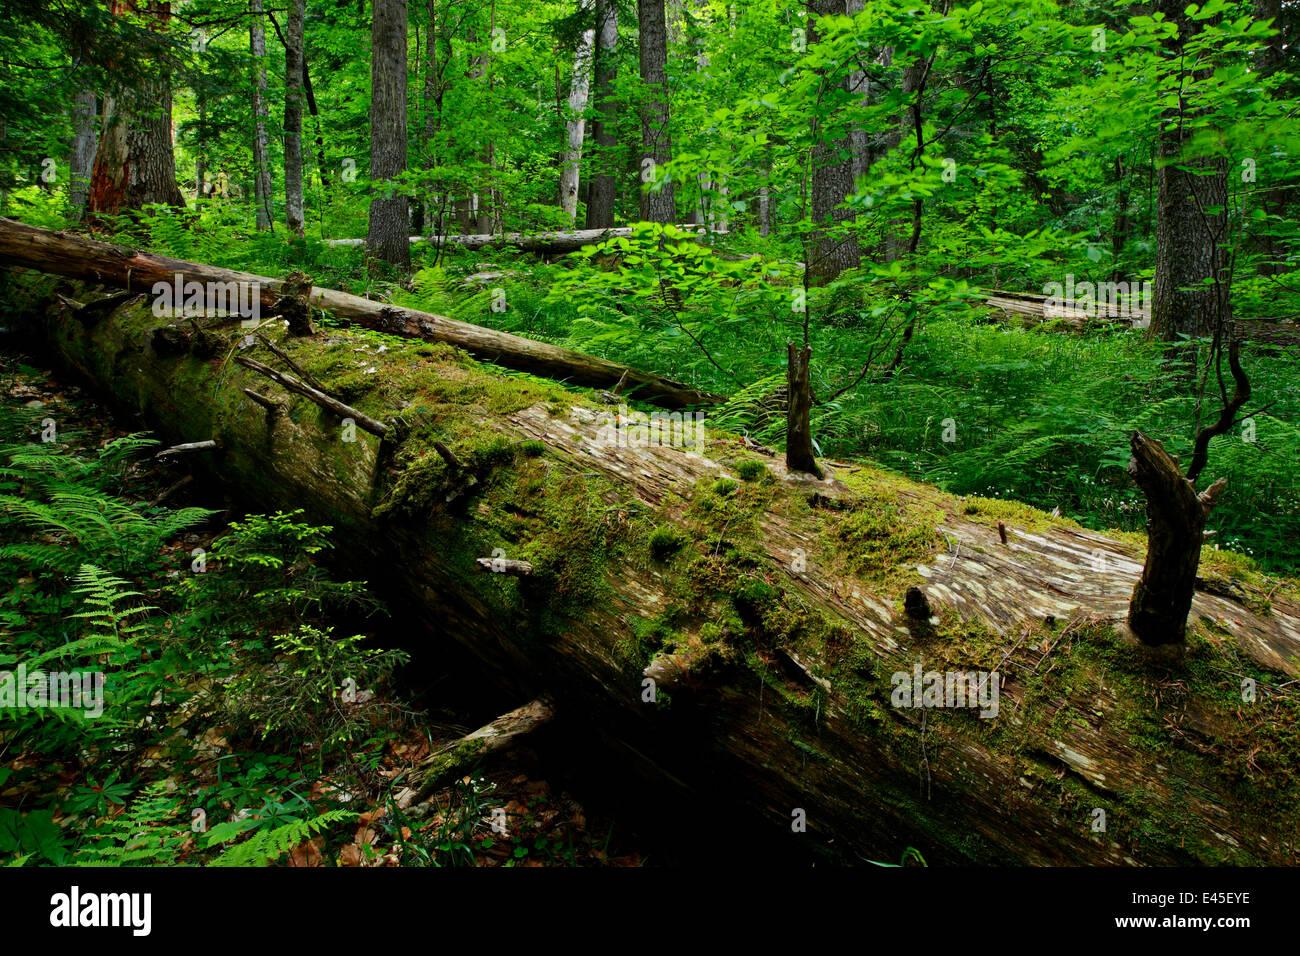 Fallen Nordmann fir (Abies nordmanniana) tree, old-growth forest, Arkhyz valley, western part of the Teberdinsky - Stock Image